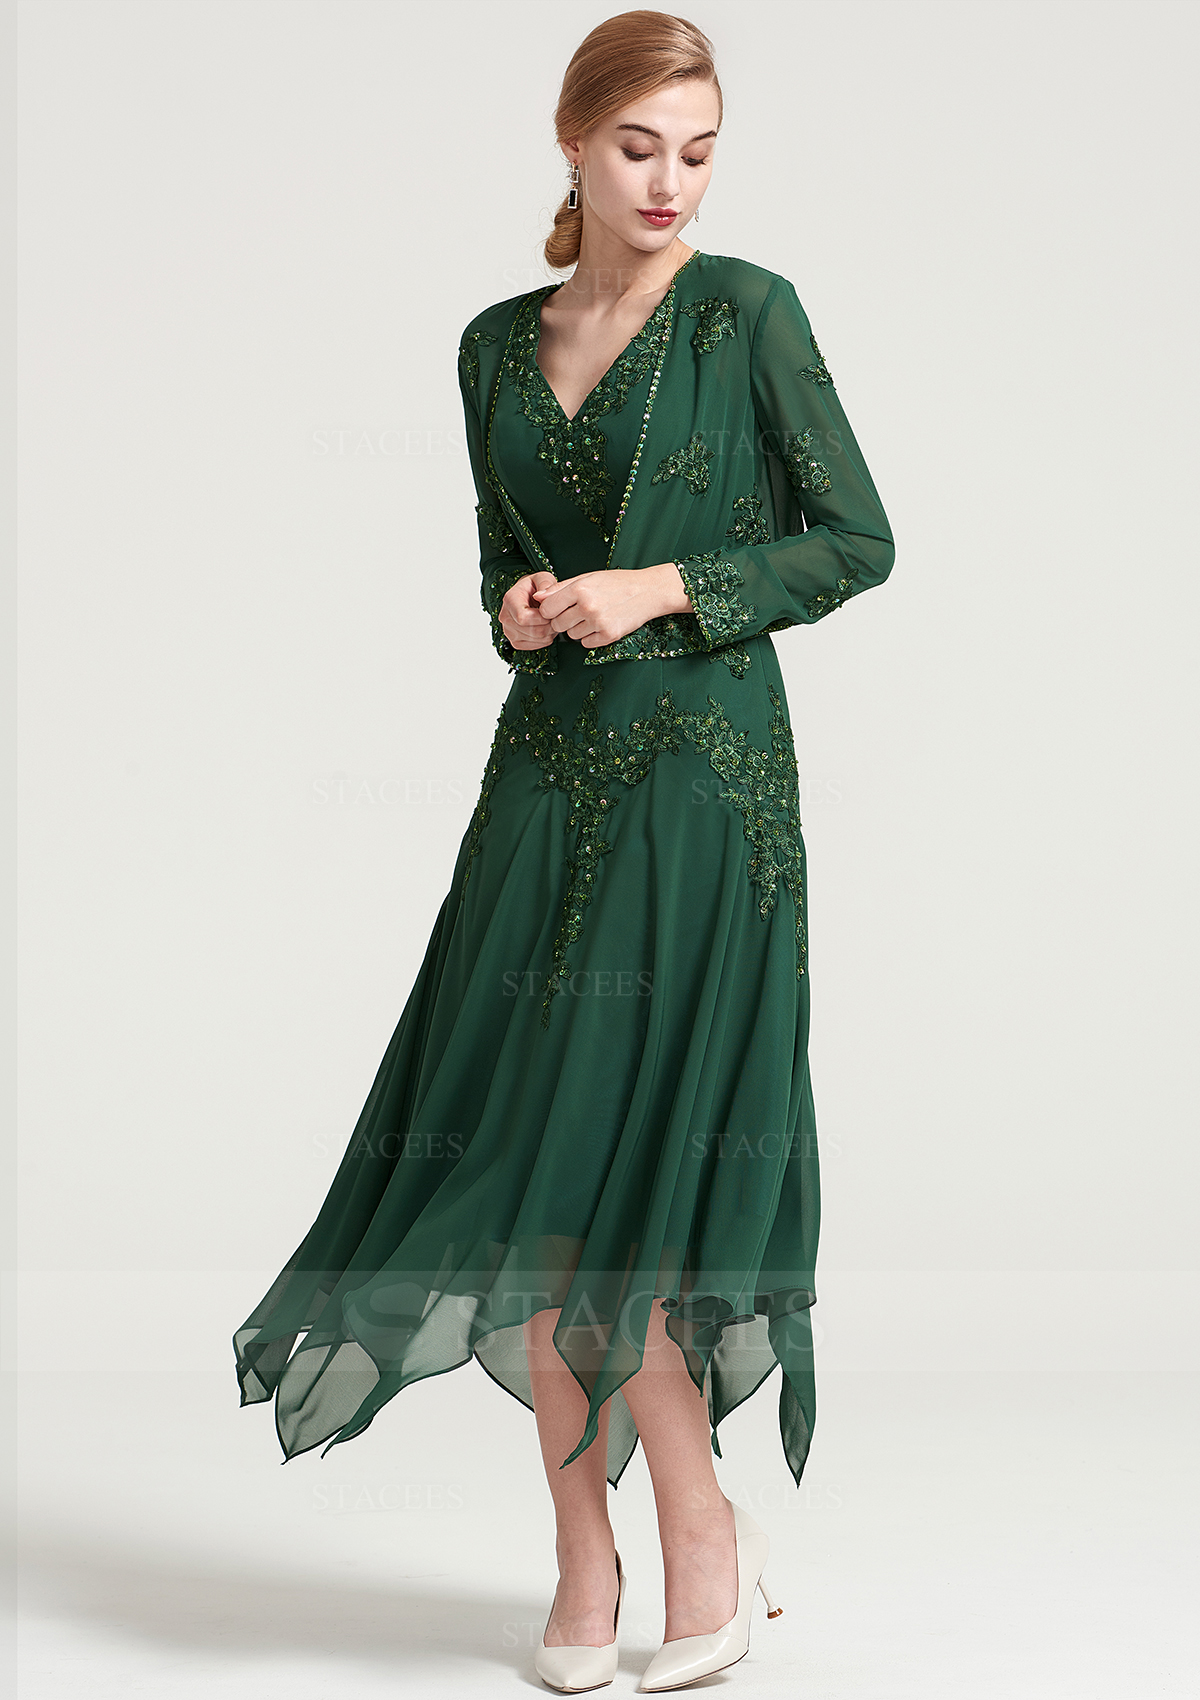 6658d6738be A-line/Princess V Neck Short Sleeve Tea-Length Chiffon Mother of the ...